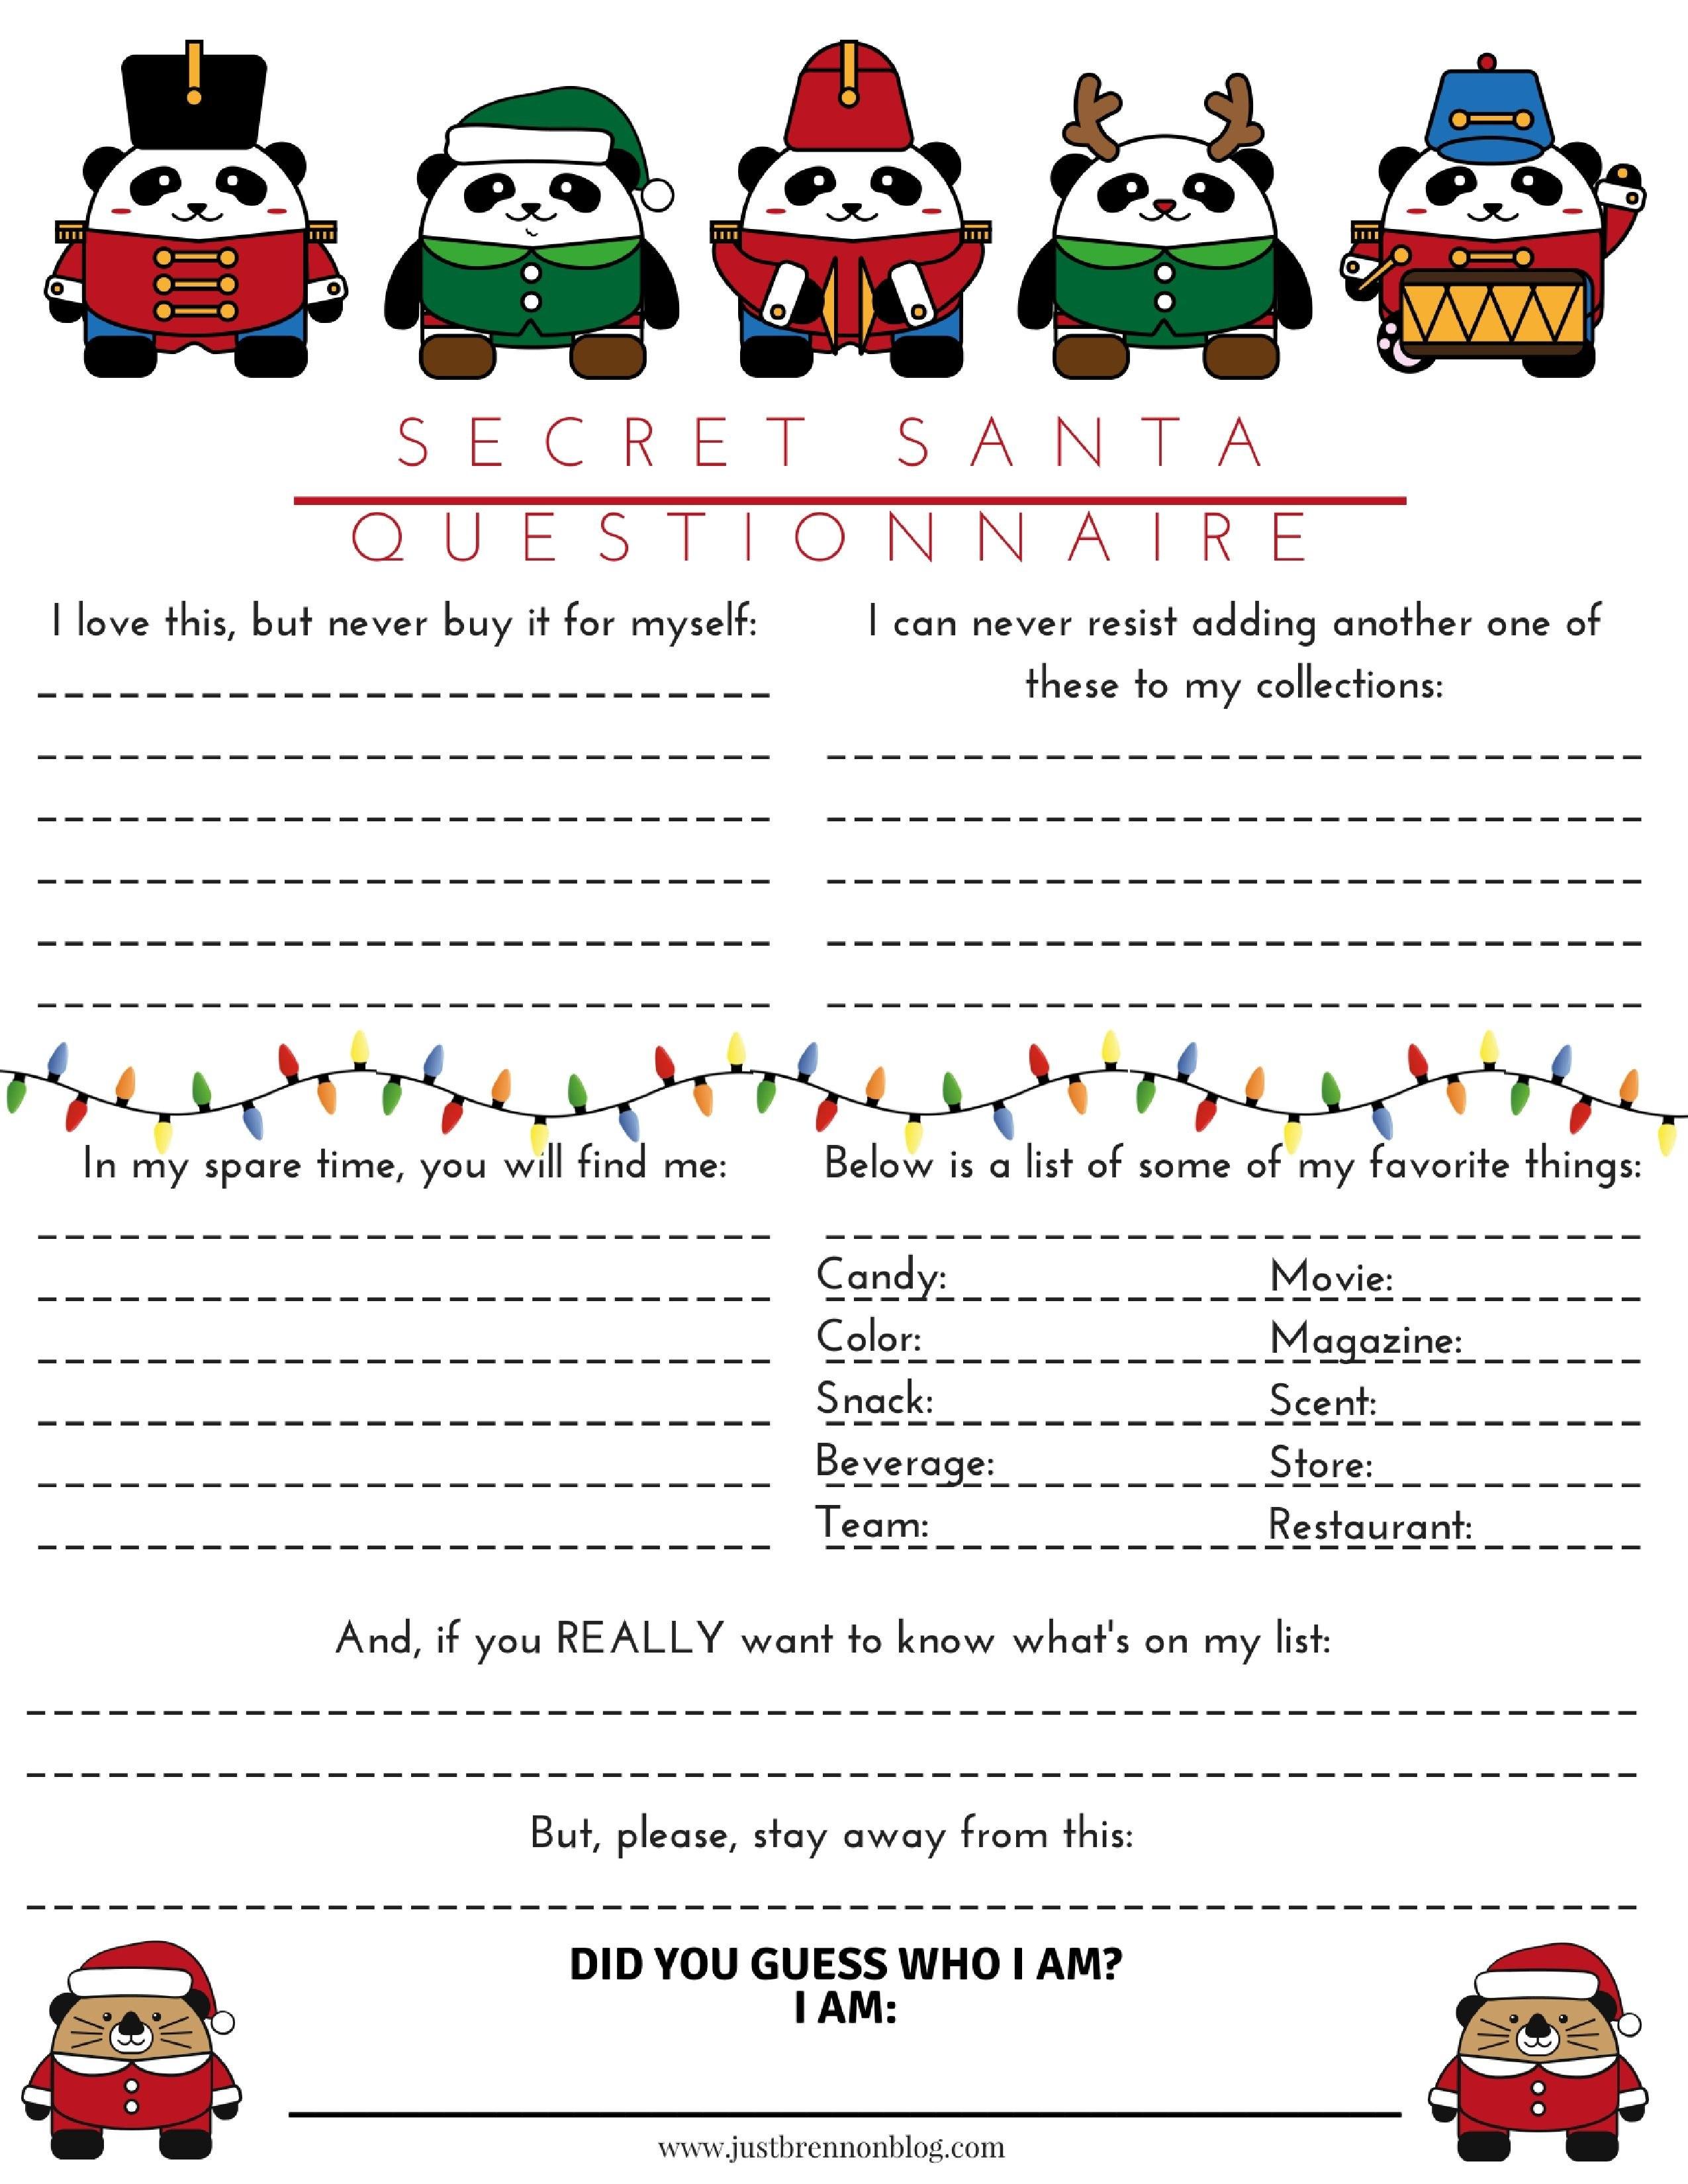 Free Download Secret Santa Questionnaire  Just Brennon Blog Pertaining To Secret Santa Label Template